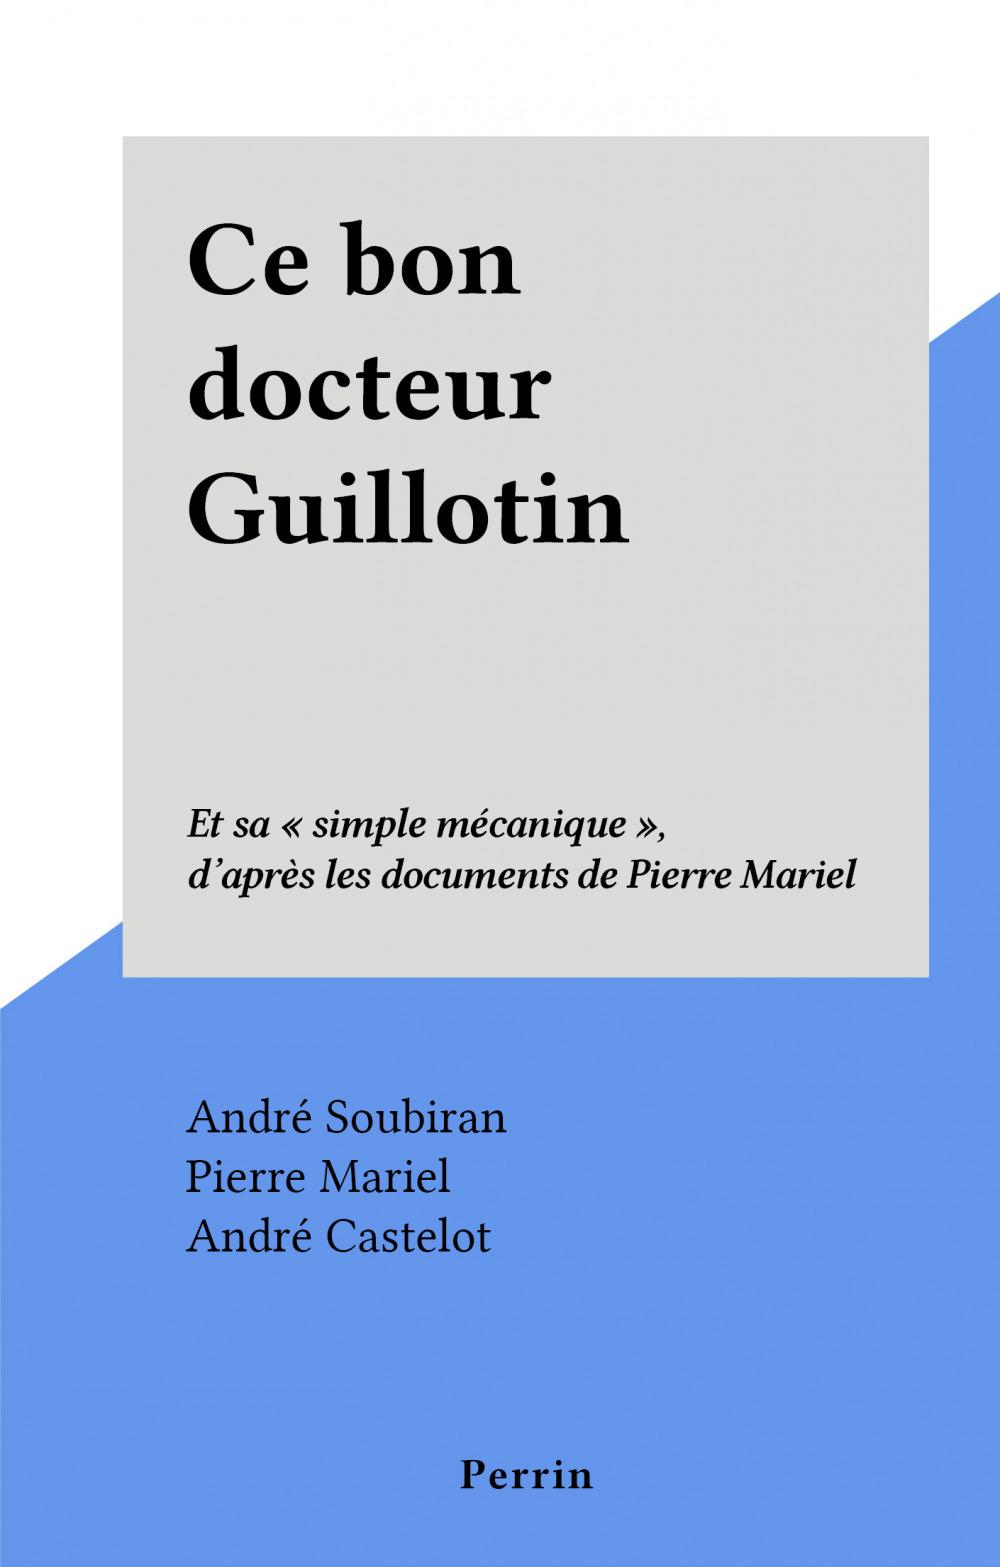 Ce bon docteur Guillotin